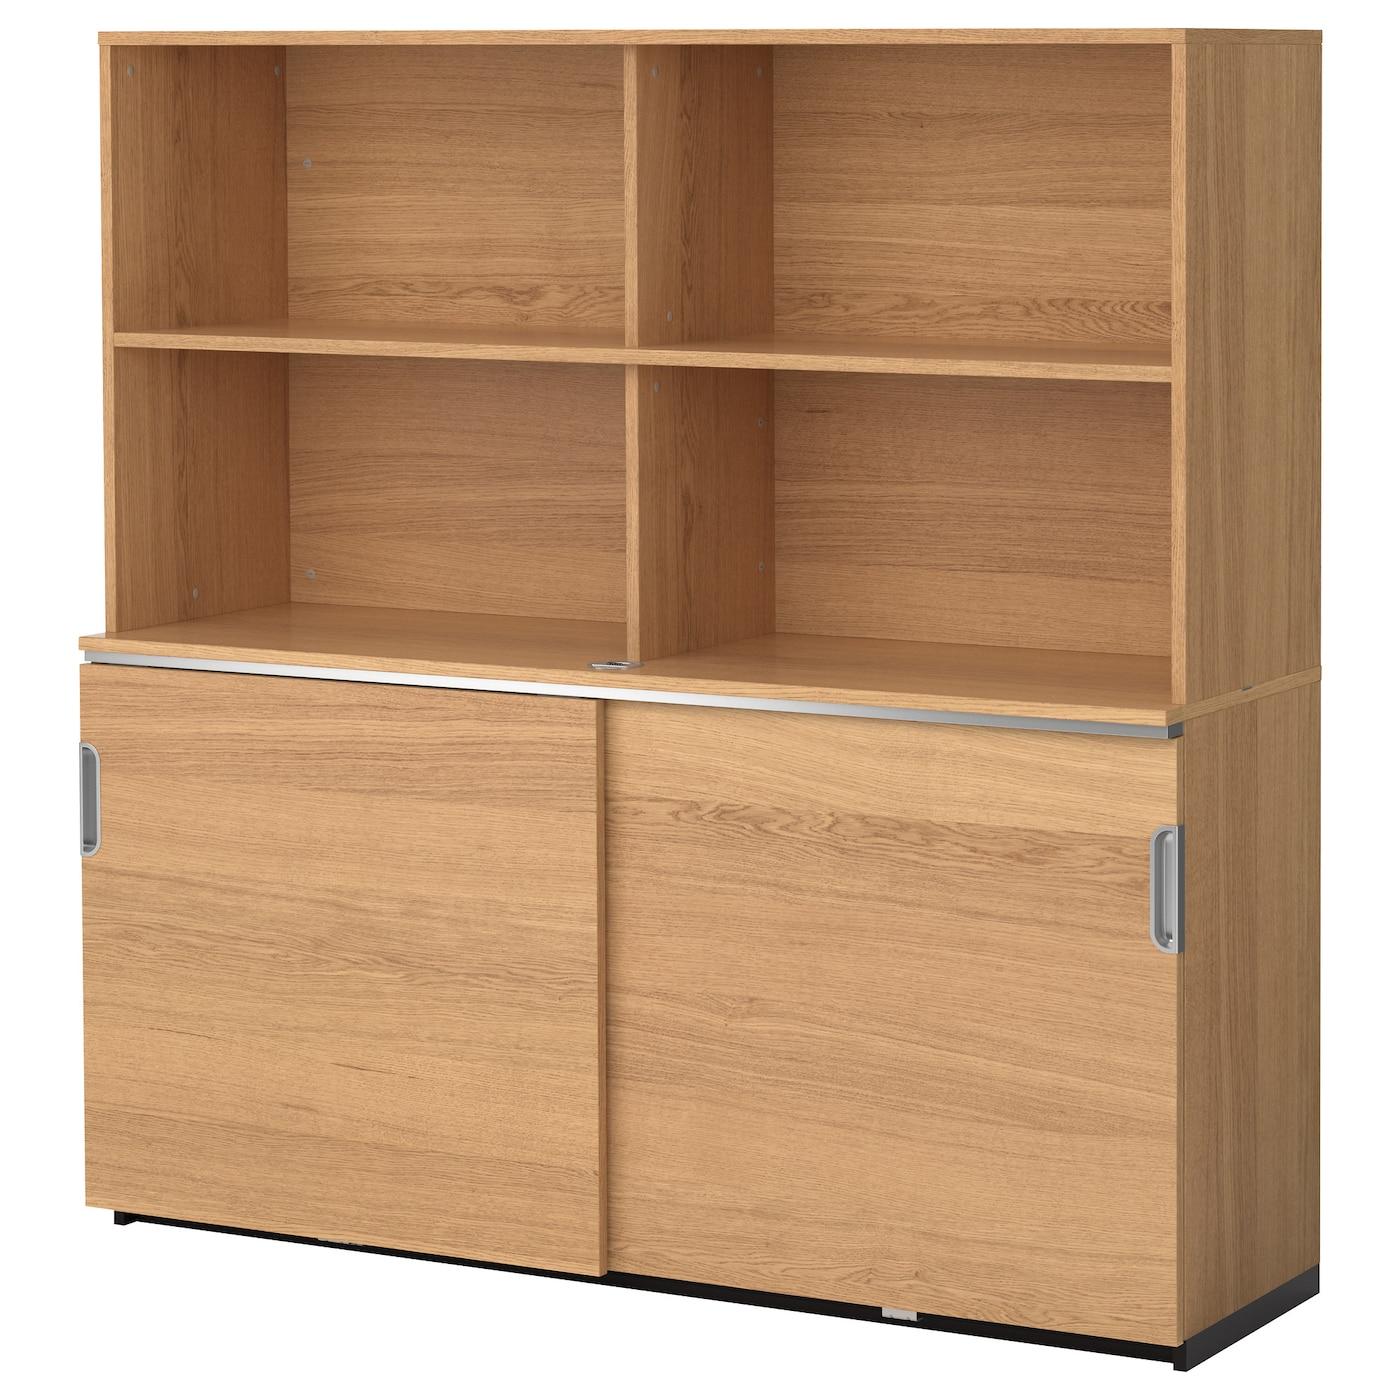 Galant Storage Combination W Sliding Doors Oak Veneer 160 X 160 Cm